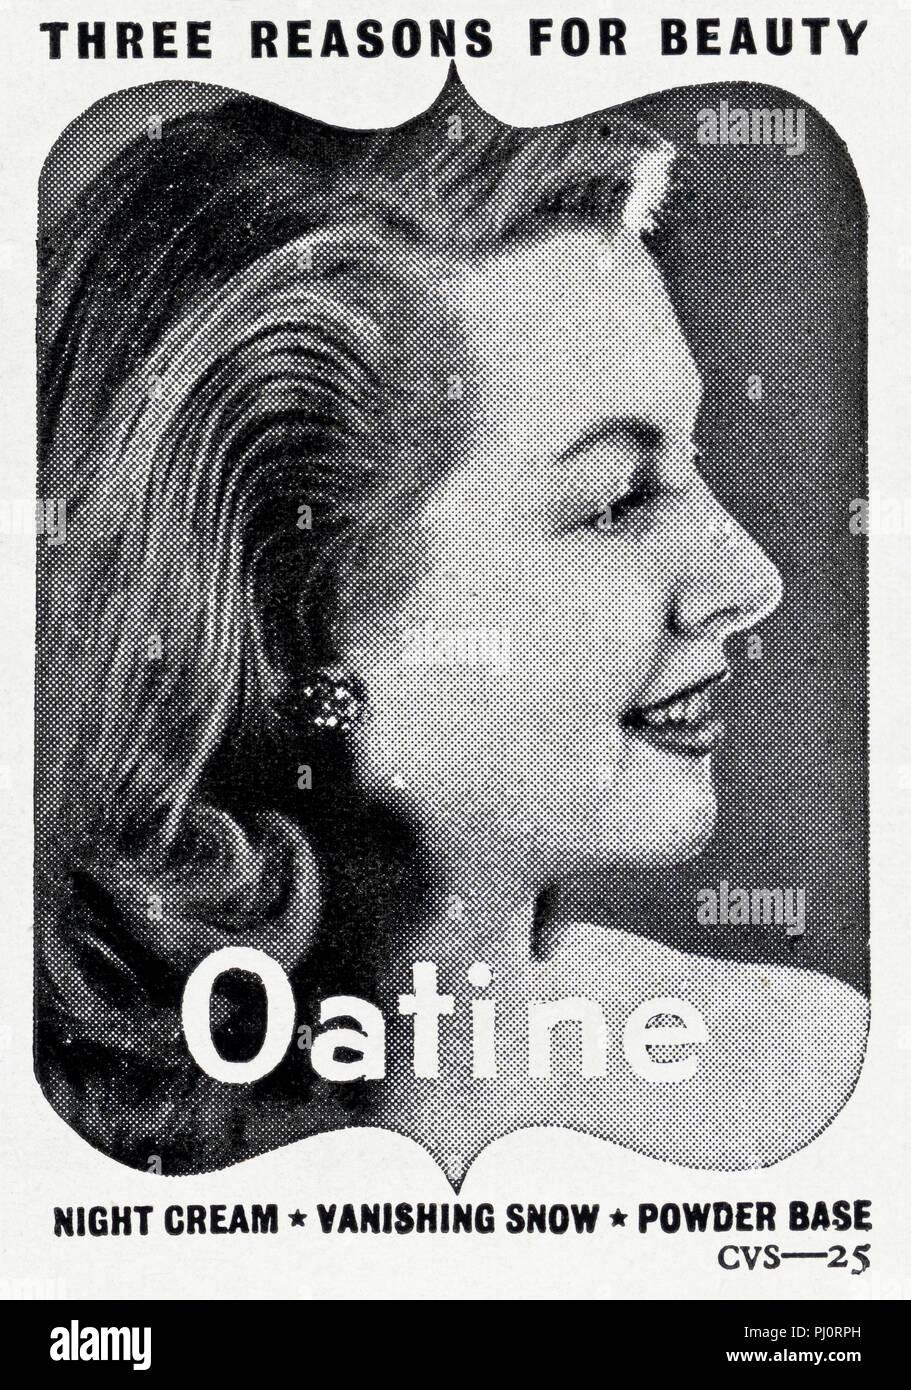 1940s old vintage original advert advertising ladies cosmetics of Oatine in English magazine circa 1947 - Stock Image